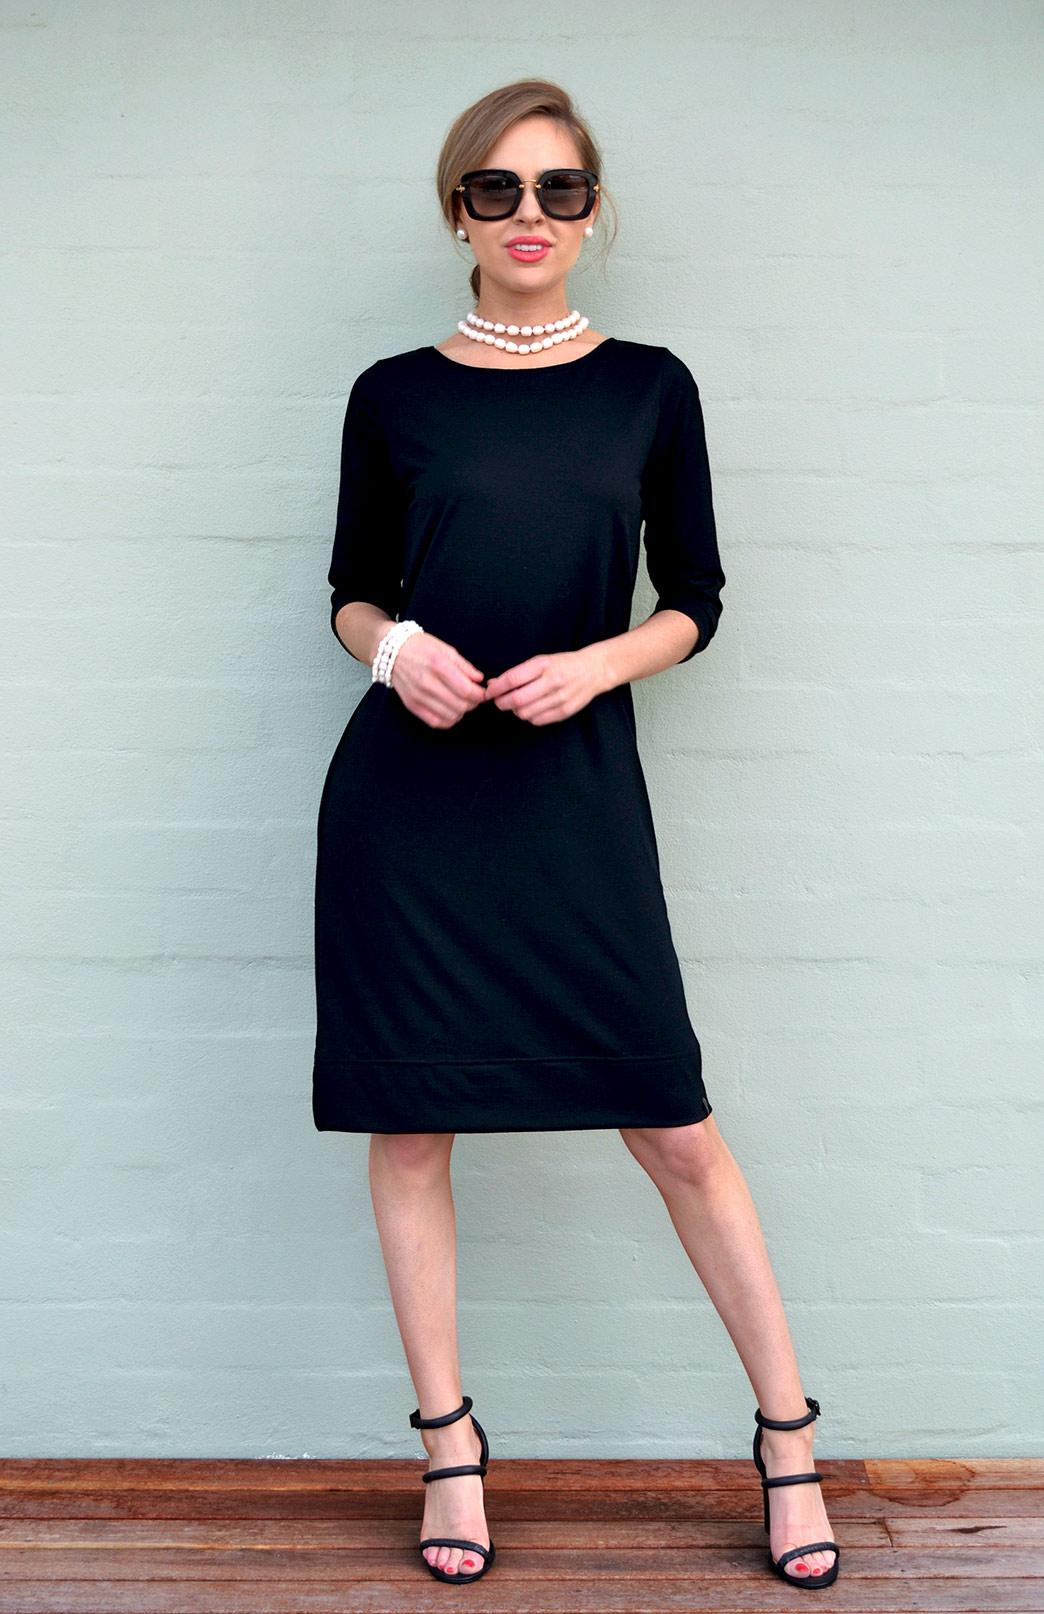 Audrey Shift Dress - Women's Black Merino Wool Classic Knee Length Dress - Smitten Merino Tasmania Australia